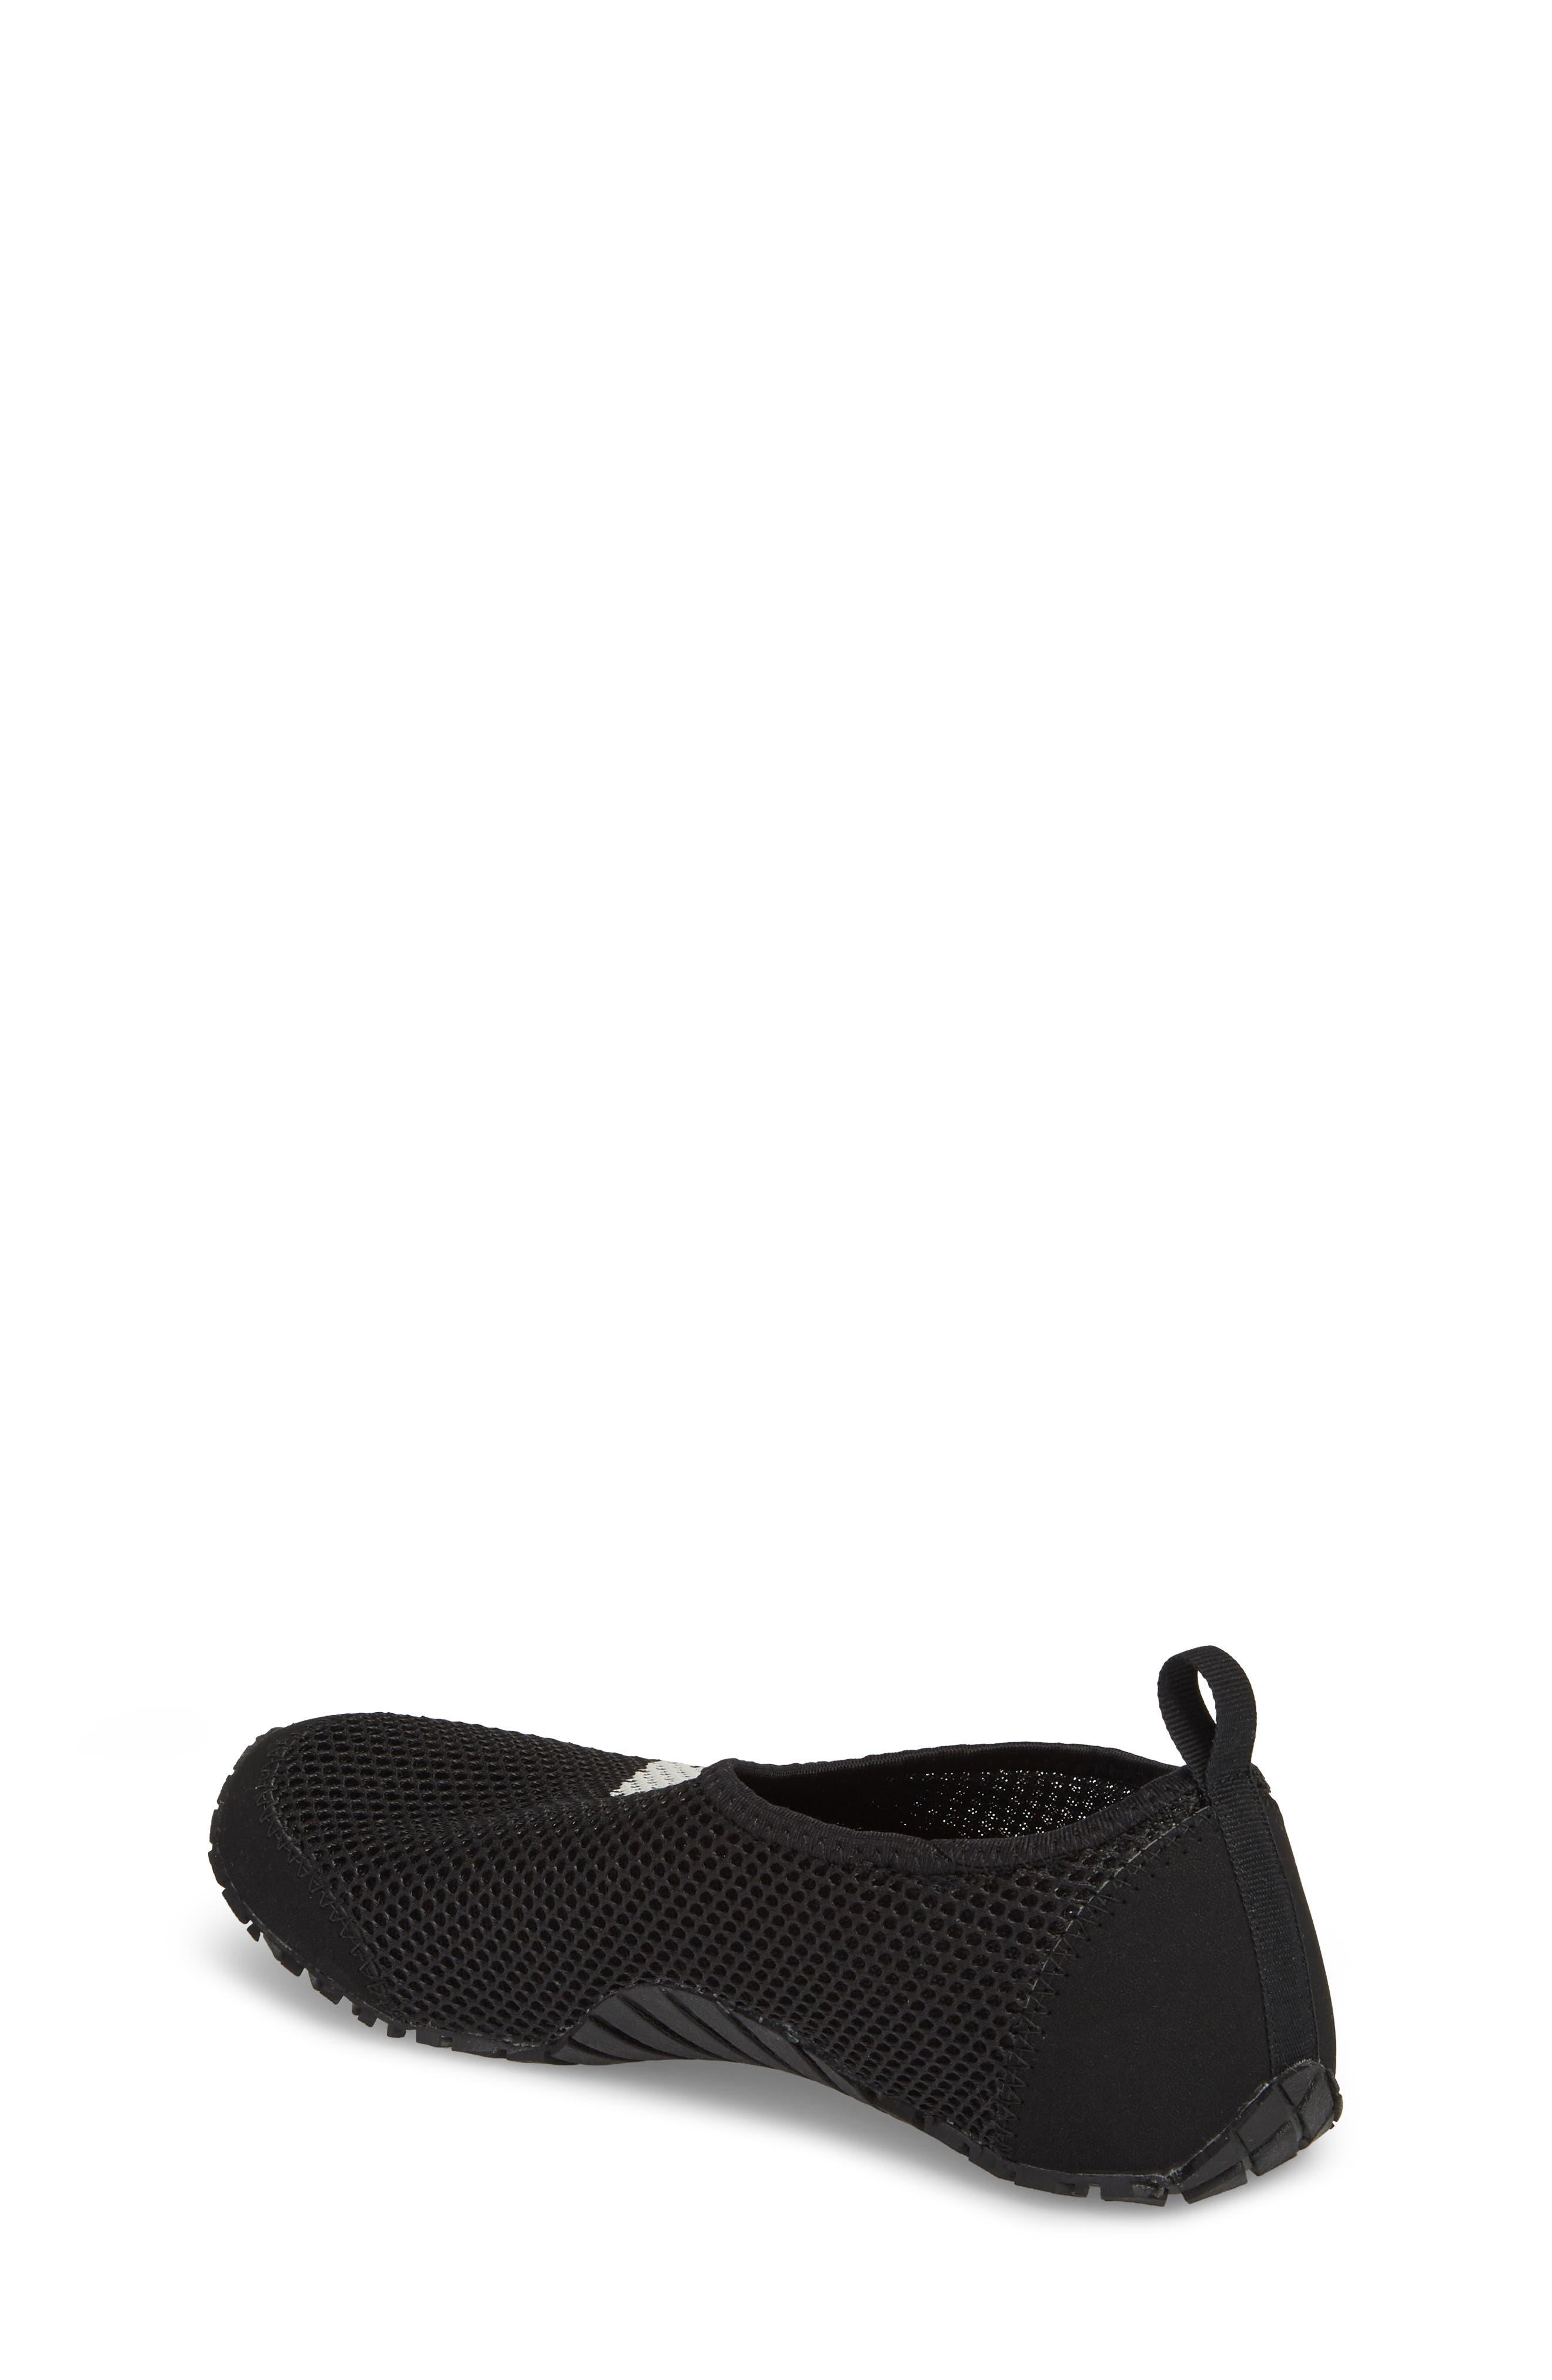 Kurobe Mesh Slip-On Water Shoe,                             Alternate thumbnail 2, color,                             BLACK/ BLACK GREY ONE